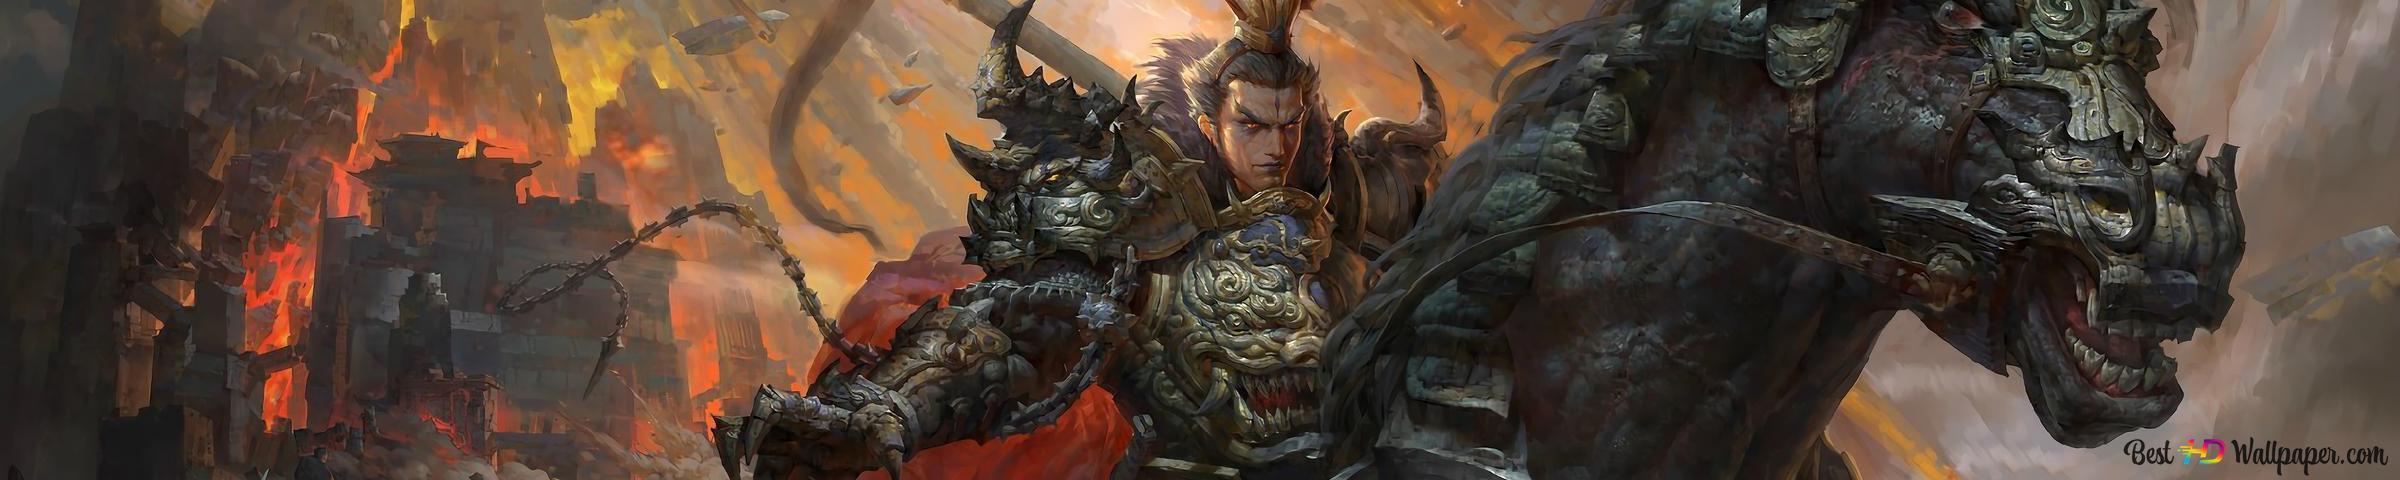 Samurai Warrior Epic Battle HD wallpaper download